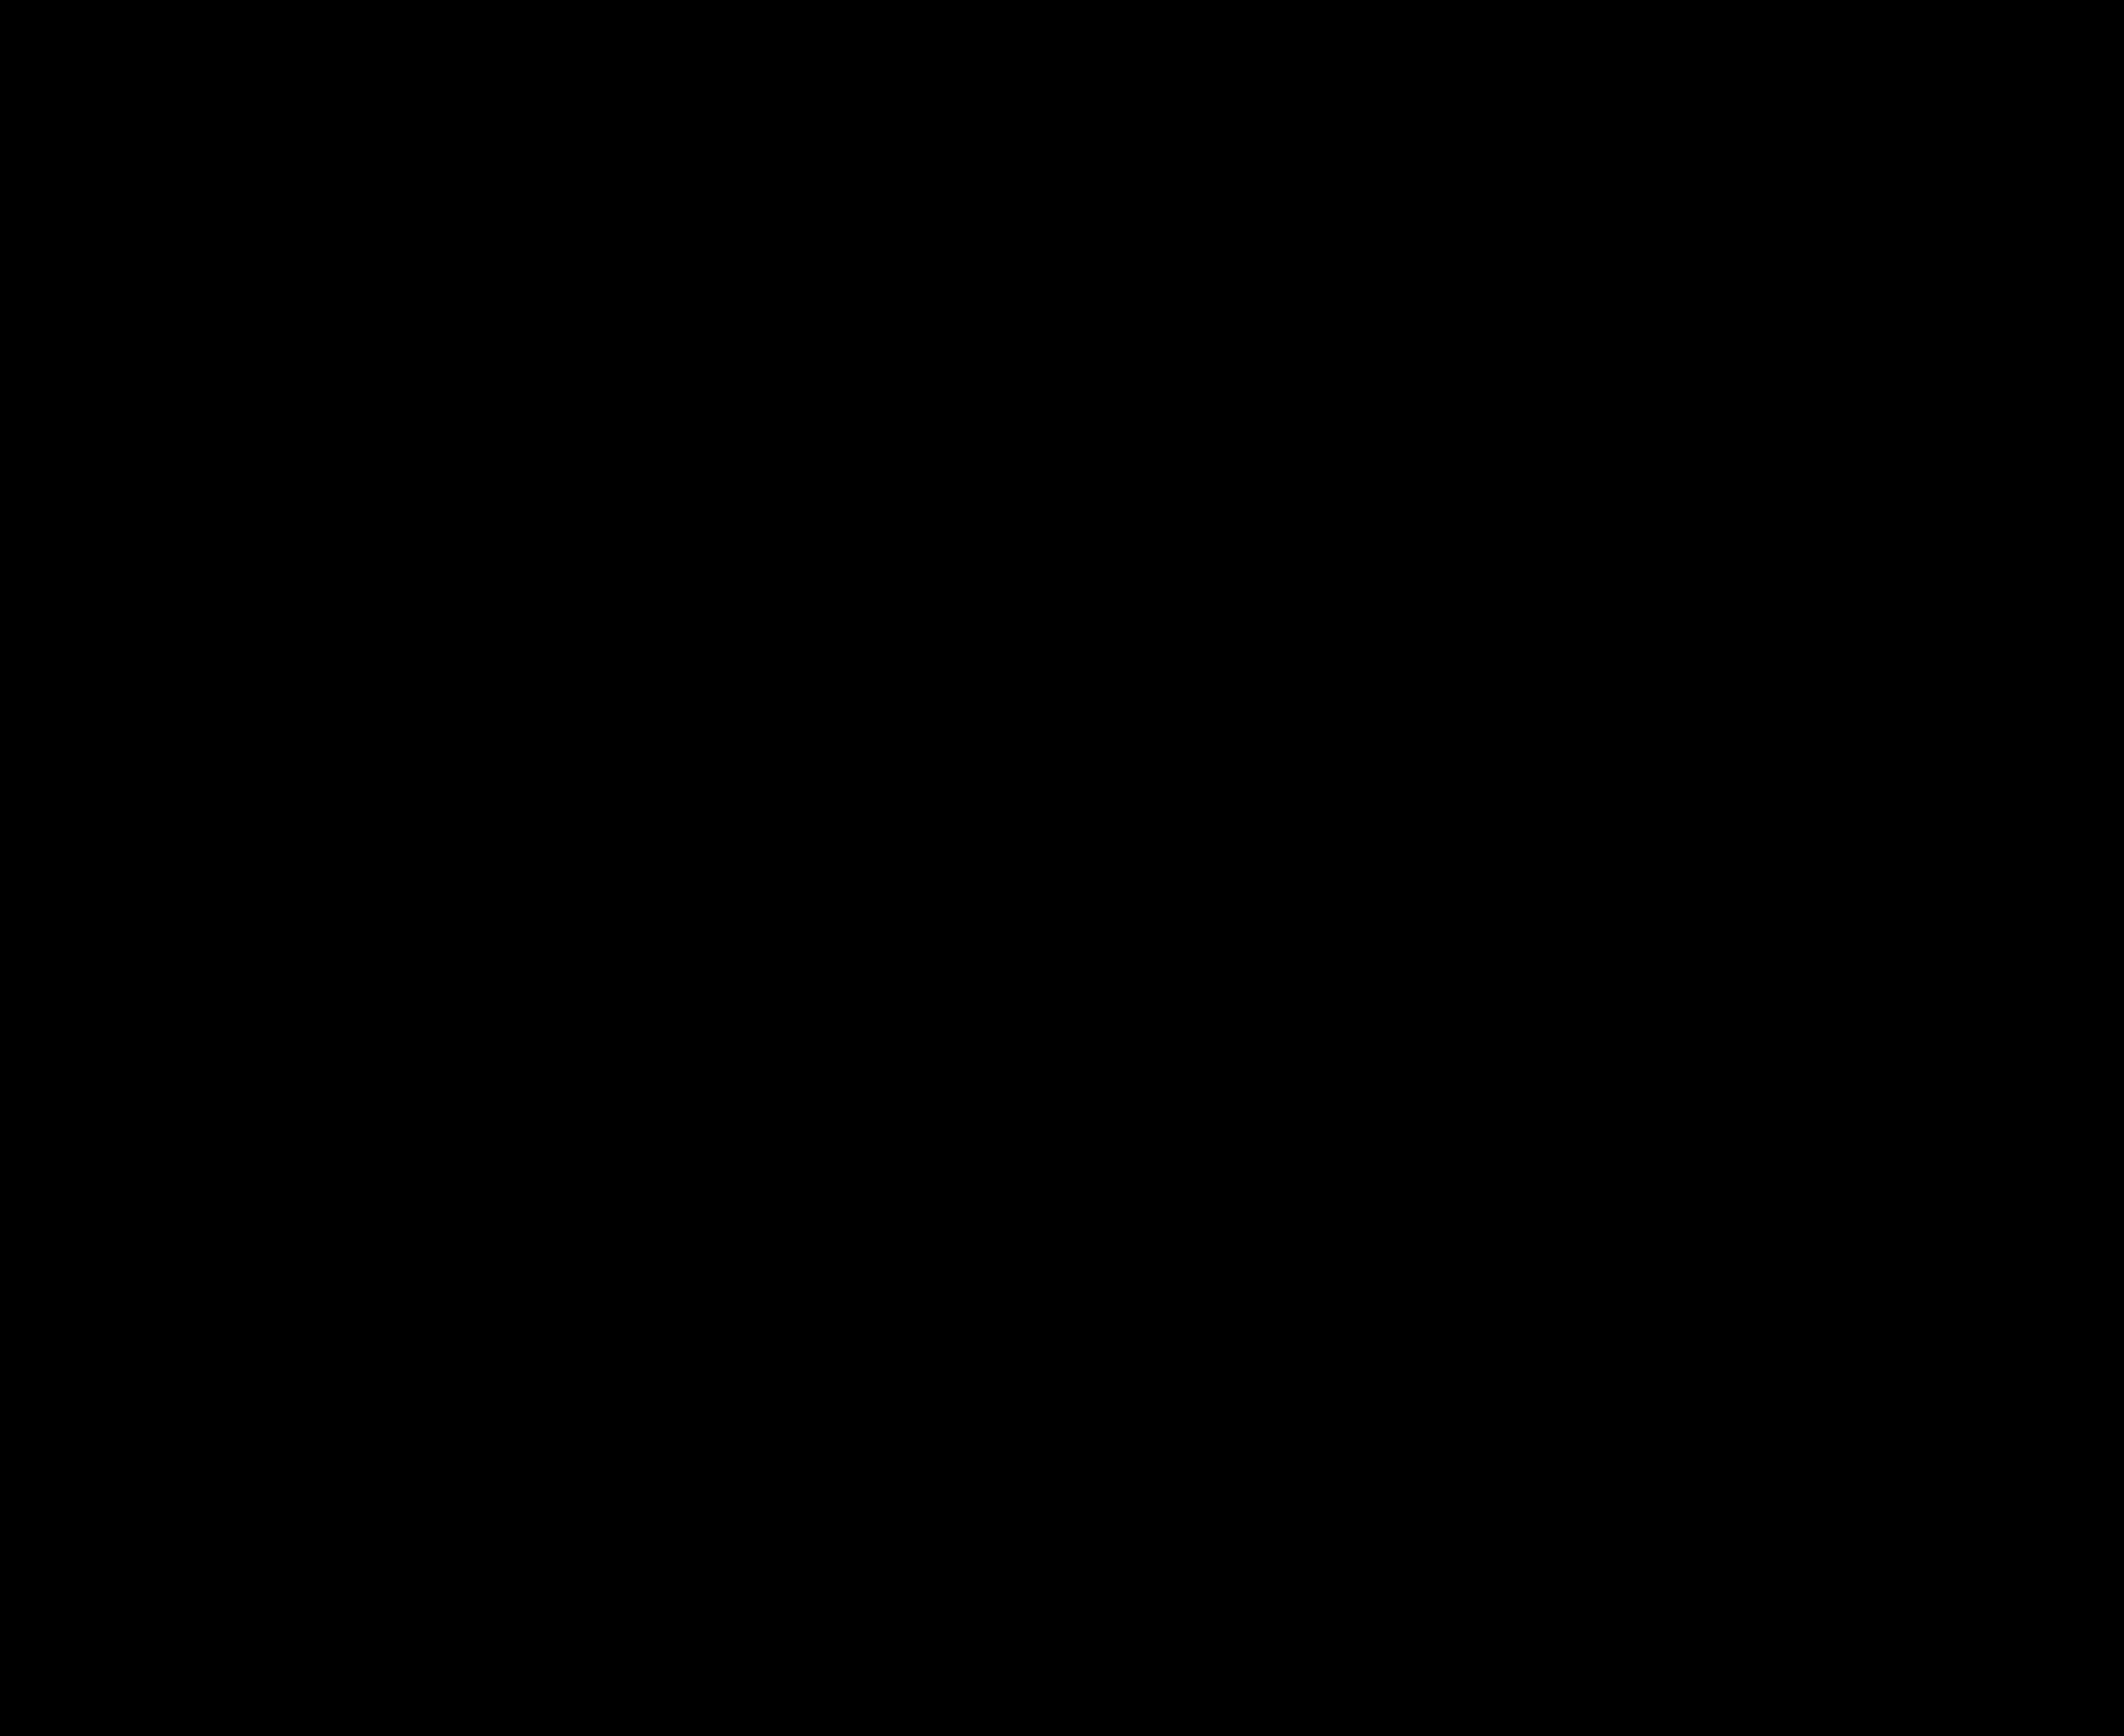 2396x1958 Horseshoe Vector Clipart Image